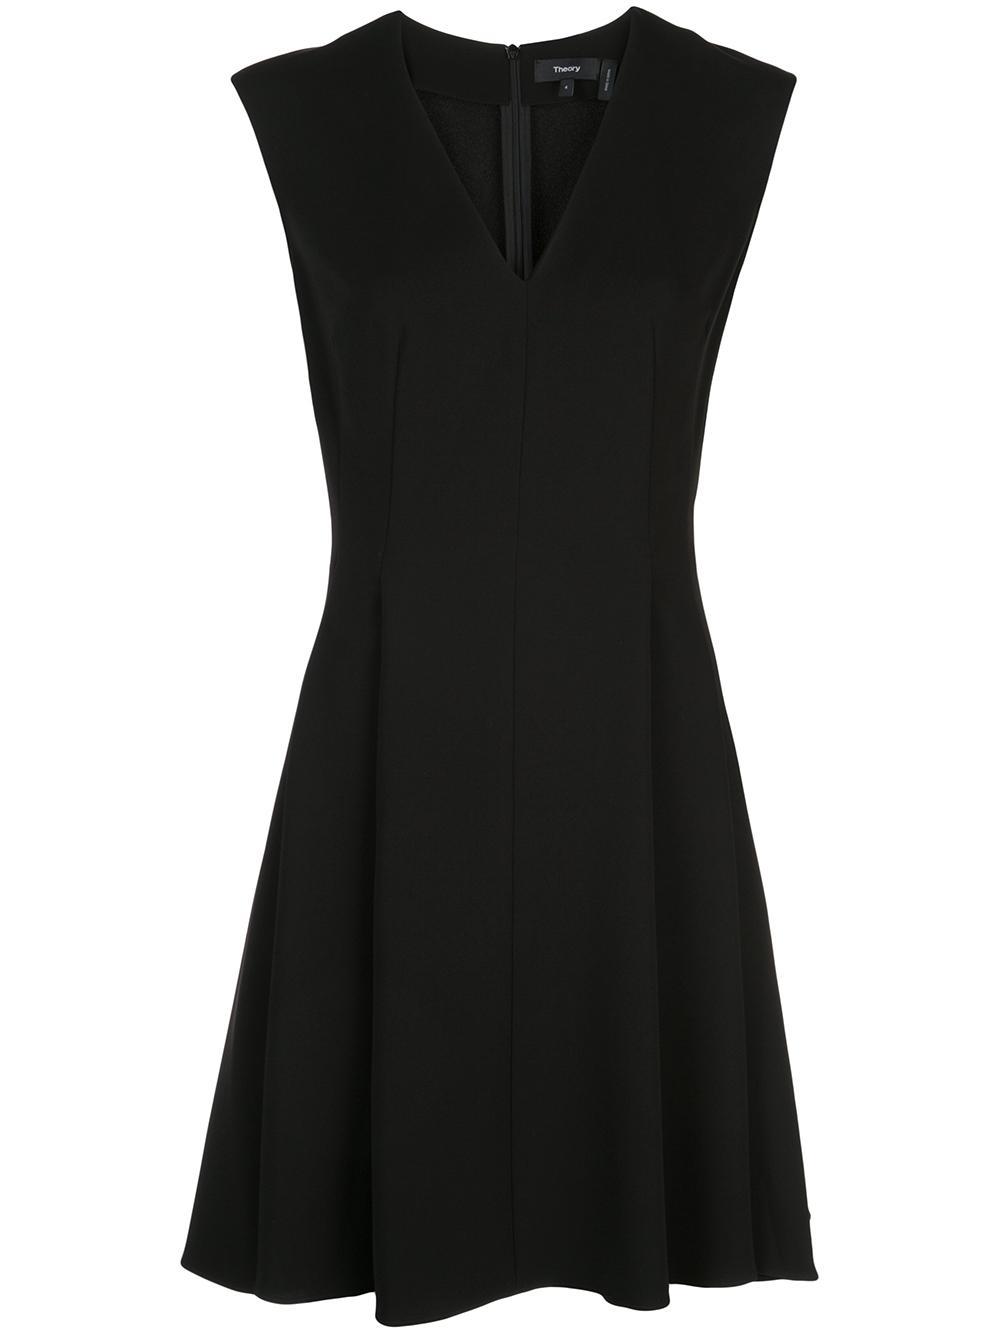 Classic Pleated Cap Sleeve Dress Item # J0709602